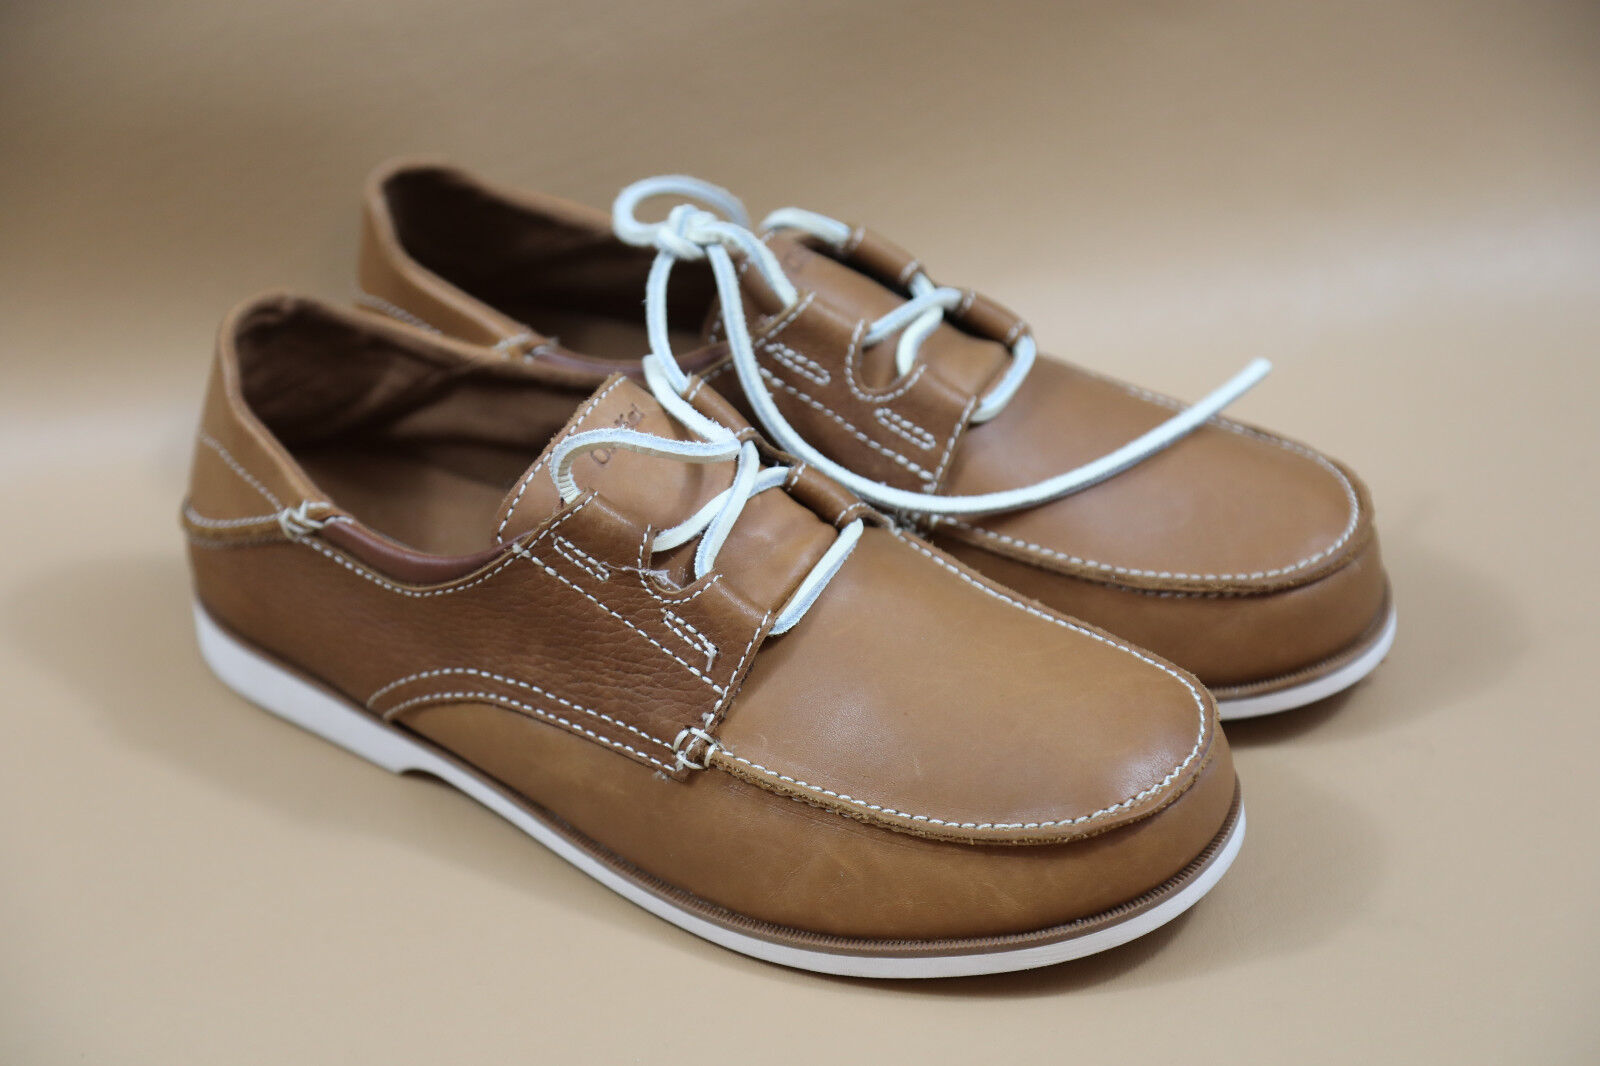 82  OLUKAI Men's MOKU Leather Boat shoes Size 9.5